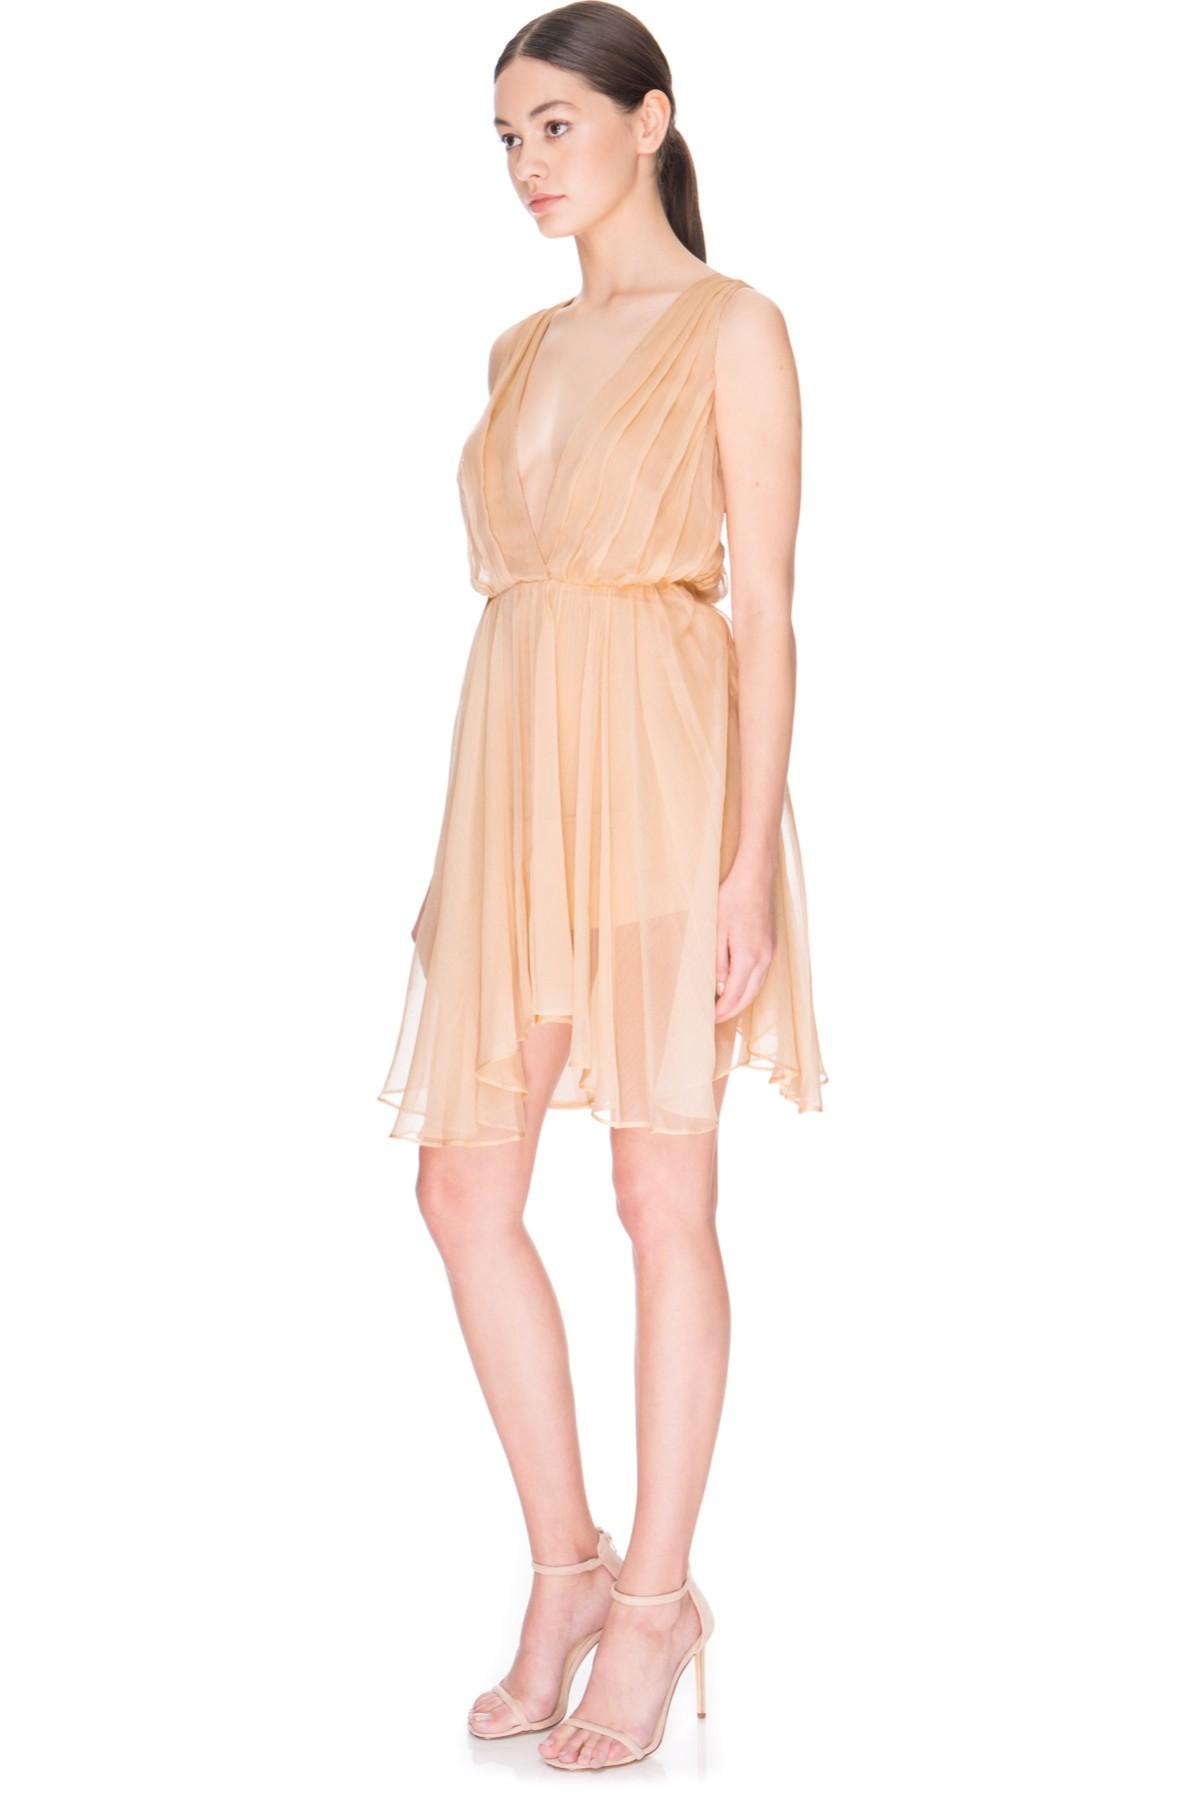 Shop Keepsake All Rise Mini Dress.